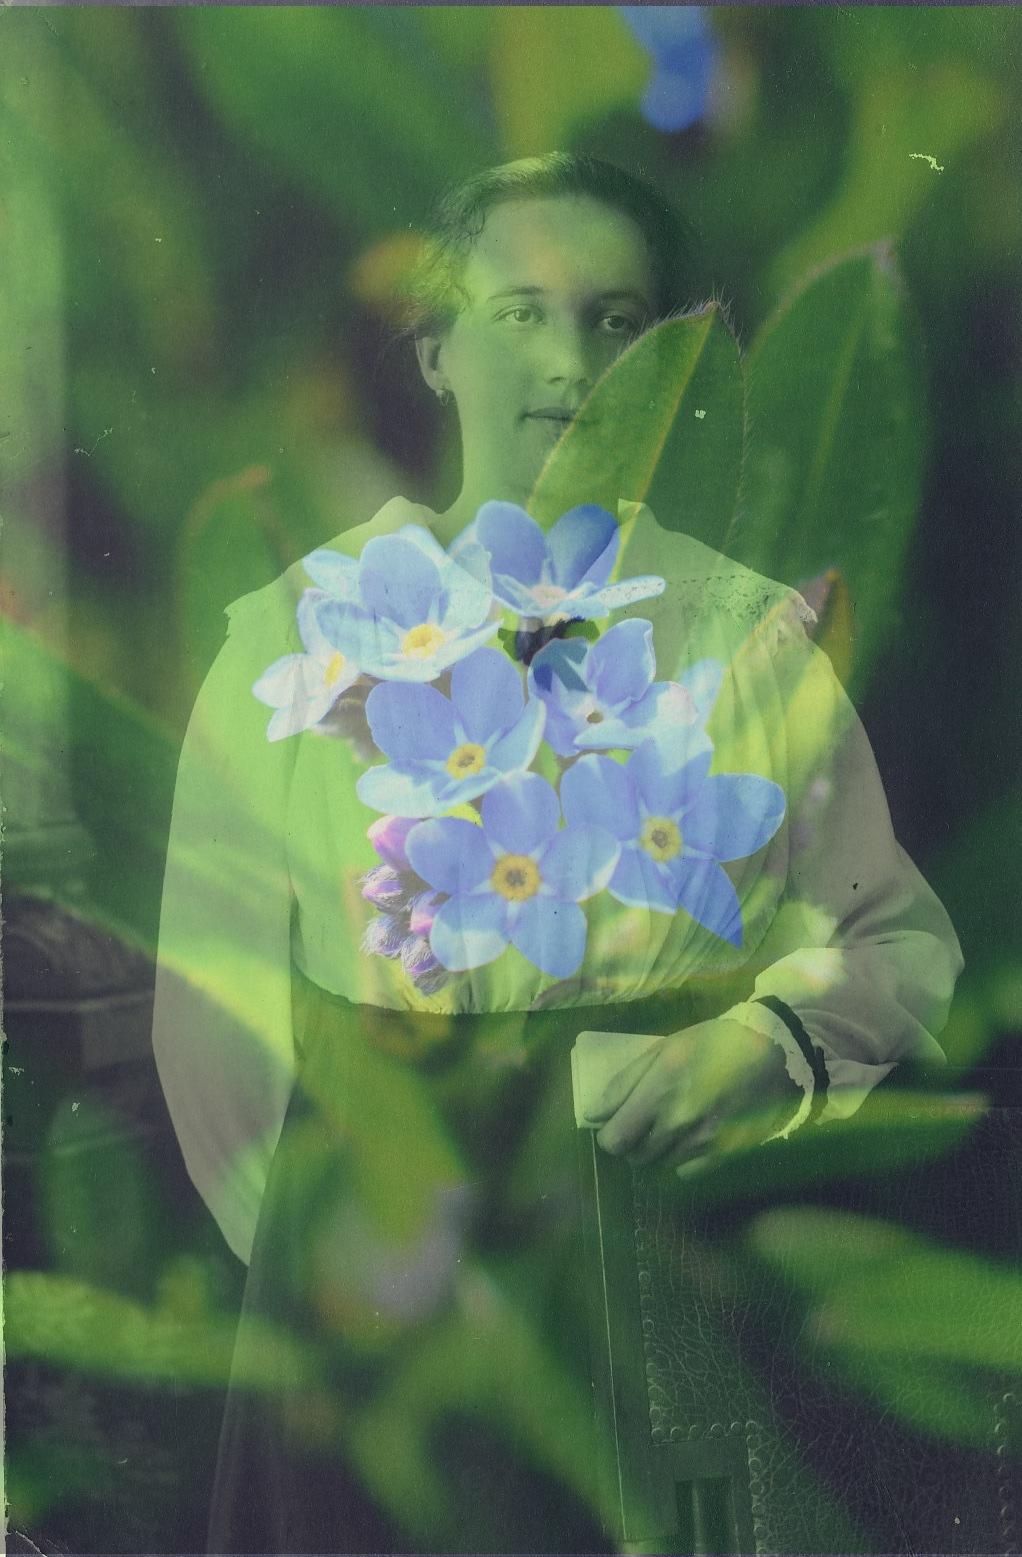 My grandmother by Javorka